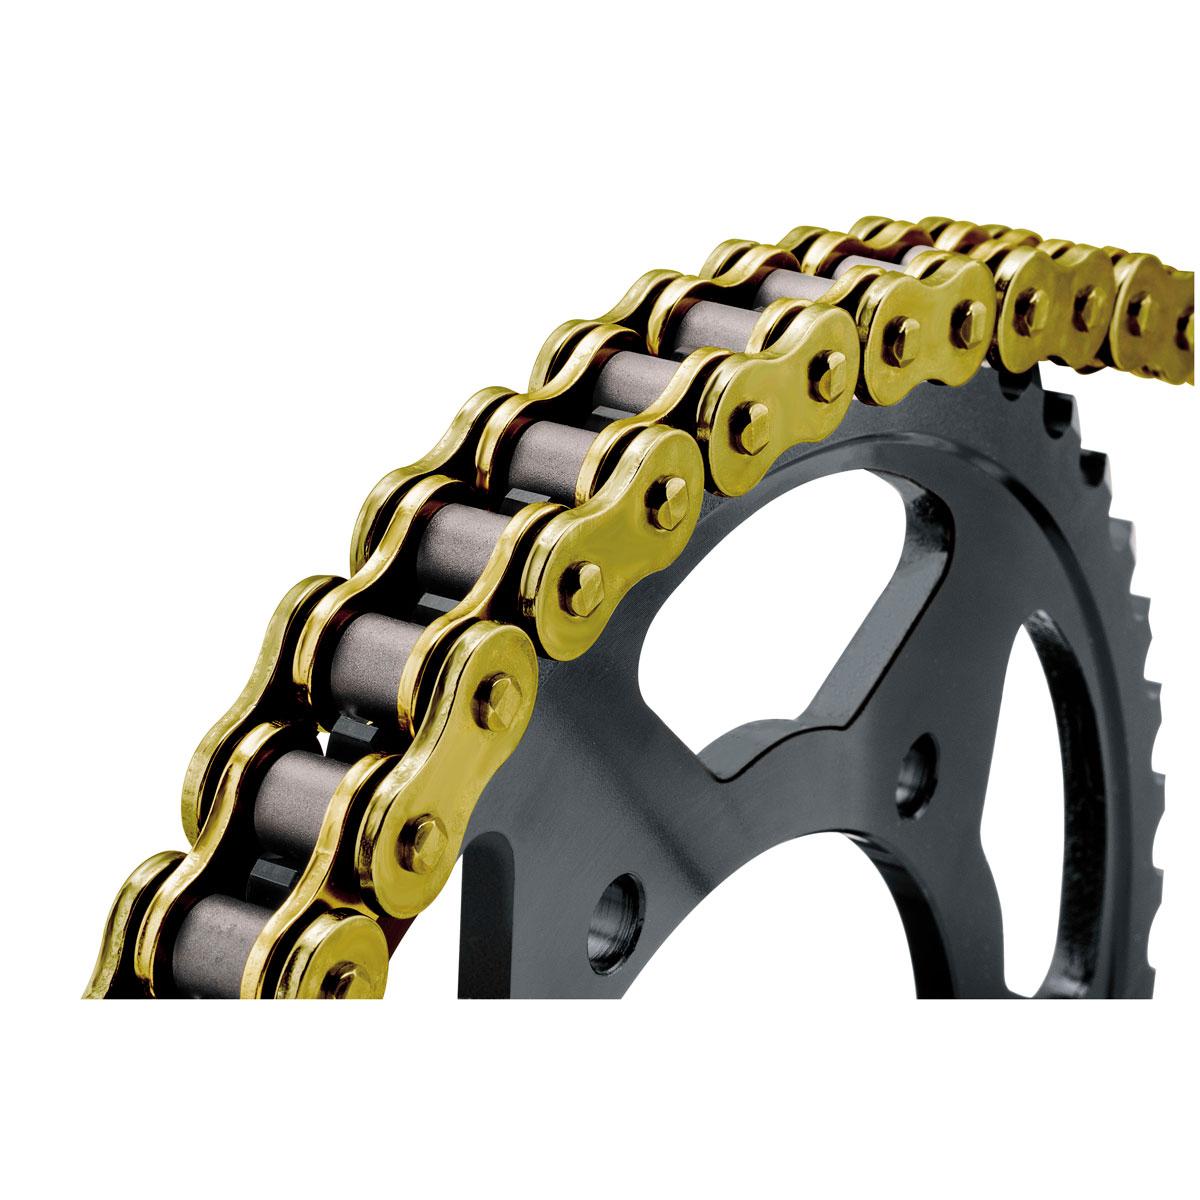 BikeMaster 530 BMOR O-ring Chain Gold/Gold